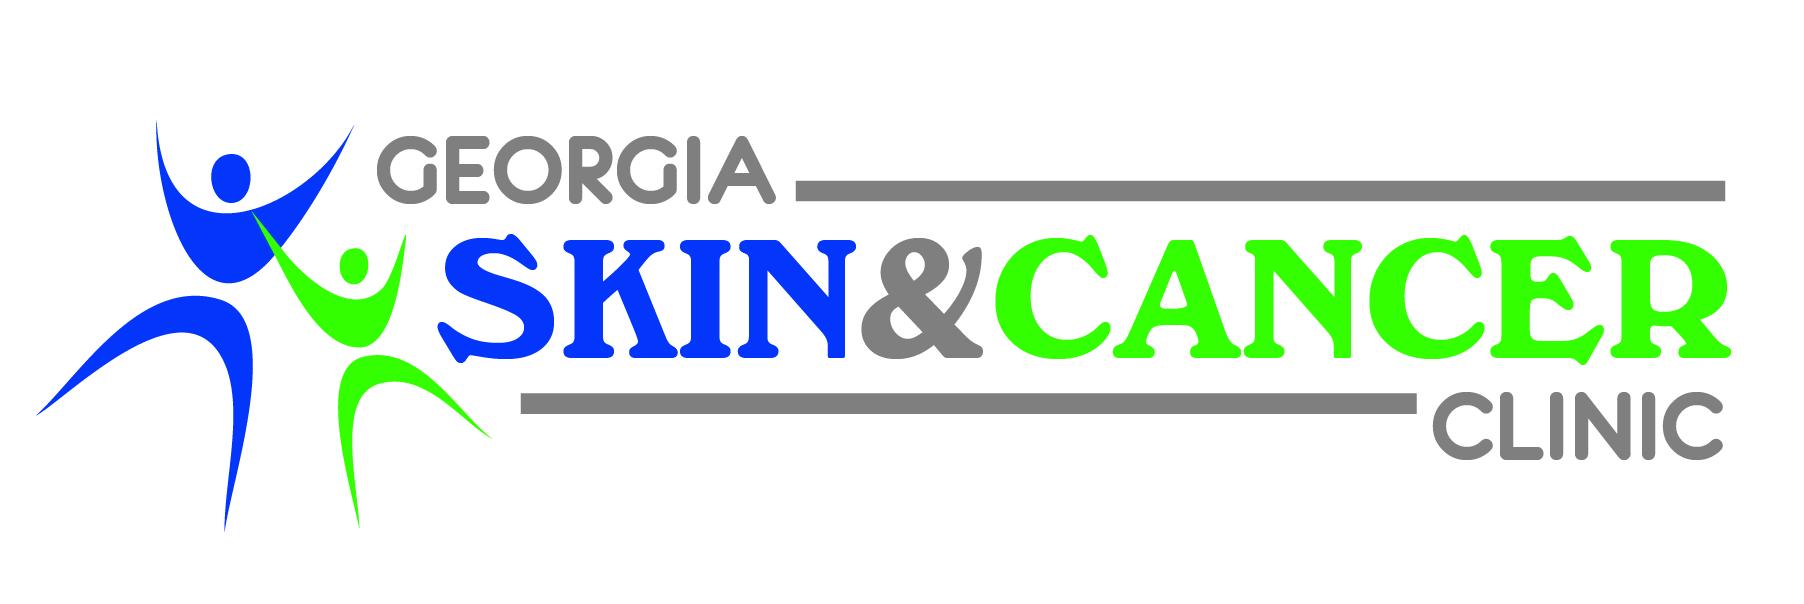 Georgia Skin & Cancer Clinic